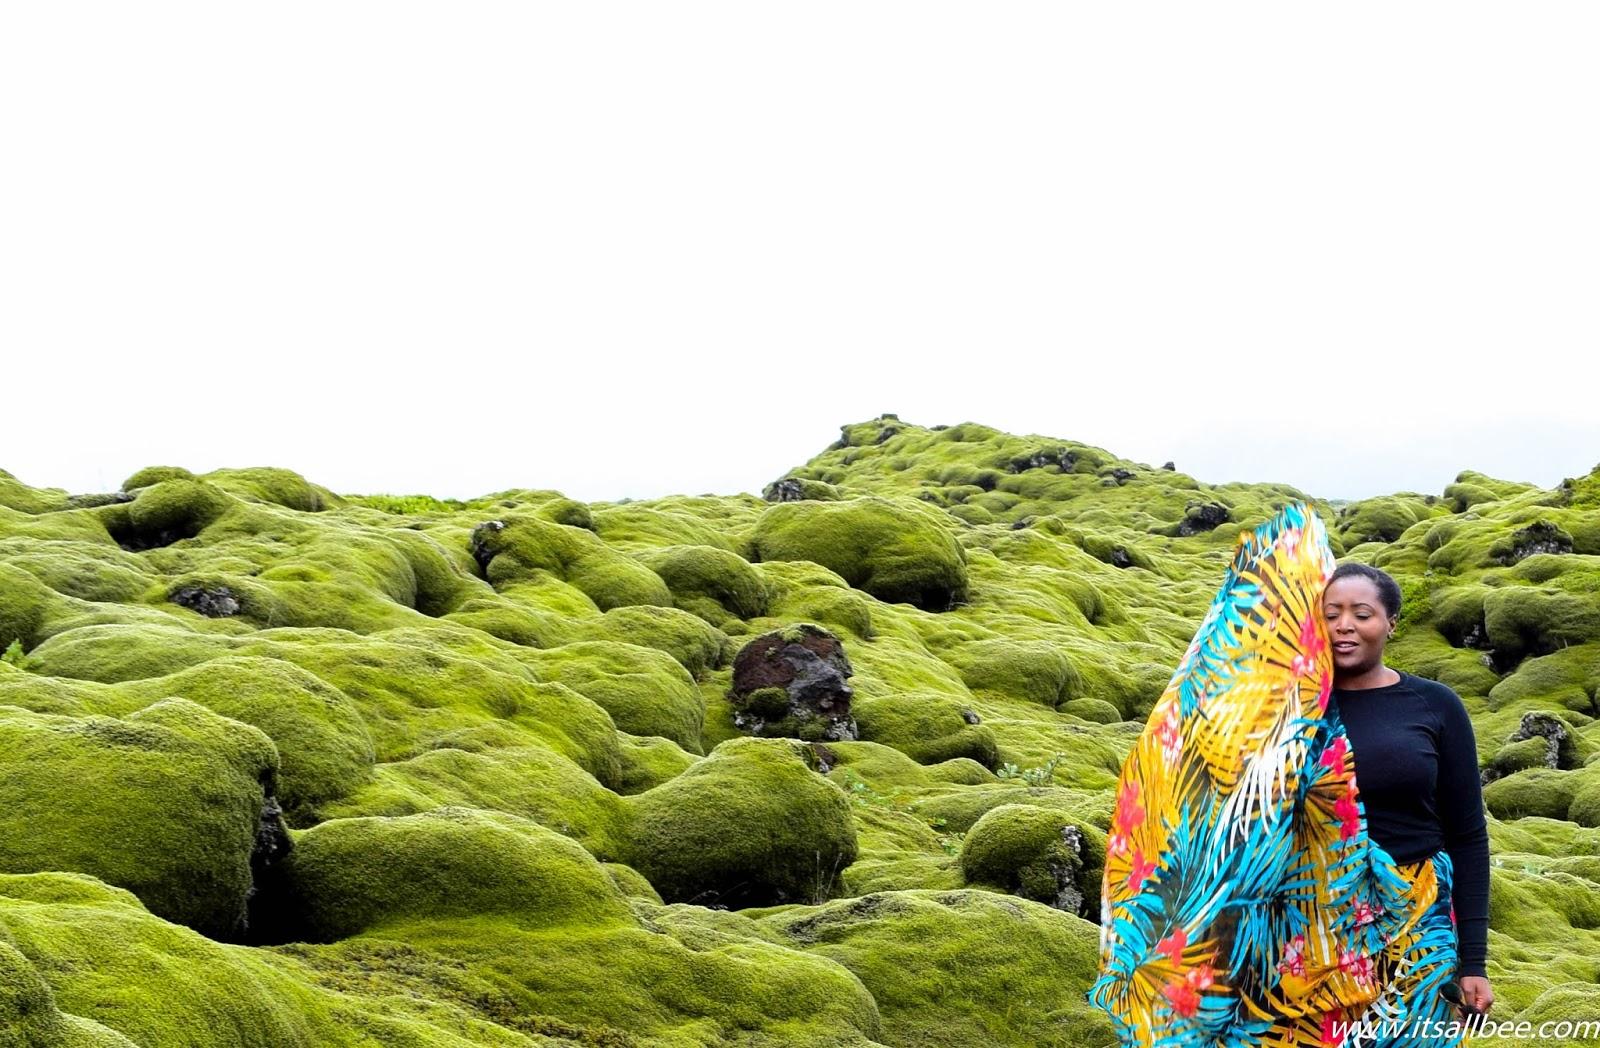 Eldhraun Iceland - Moss Lava Fields